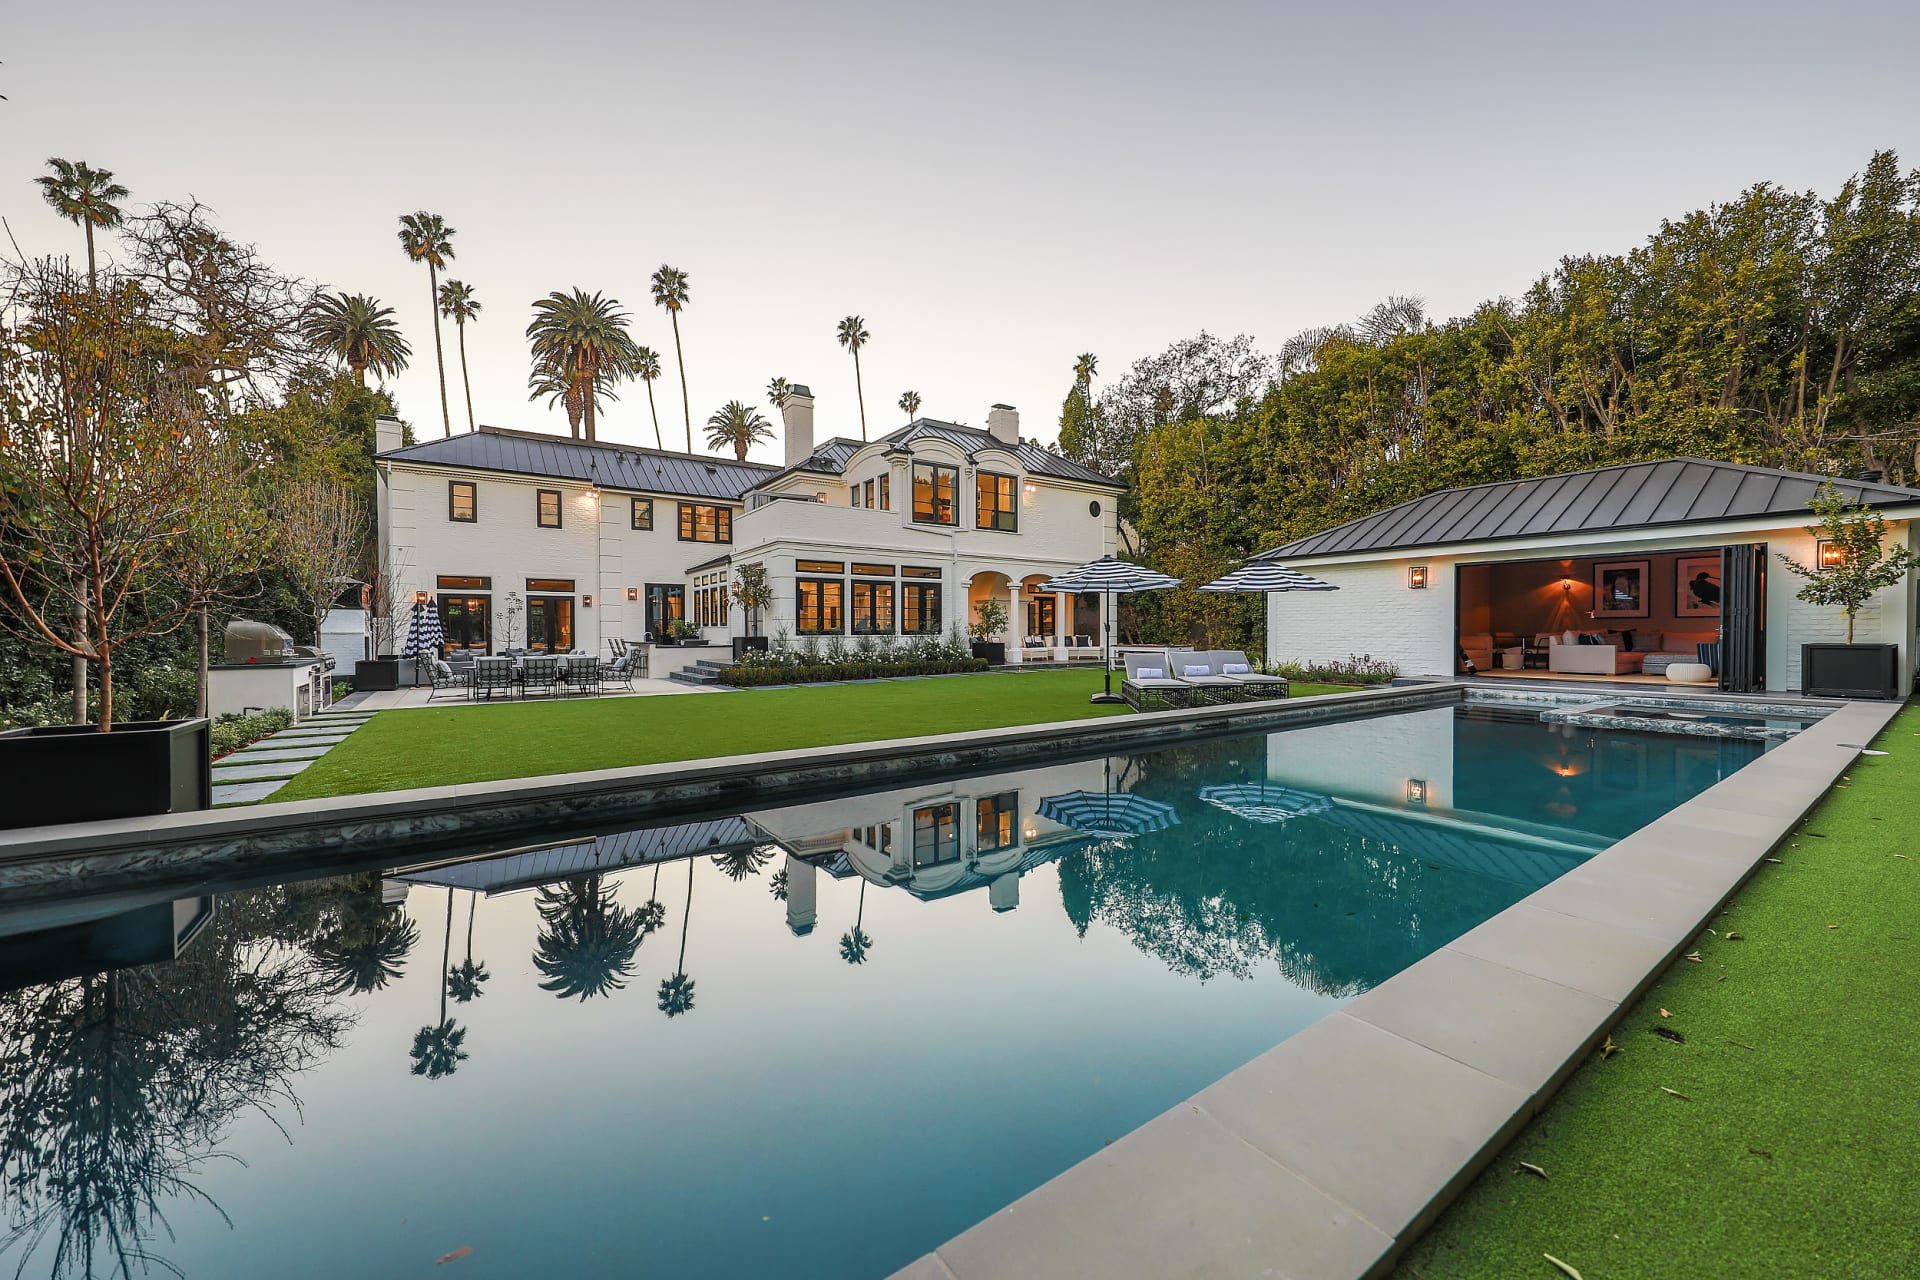 Beverly Hills Flats photo